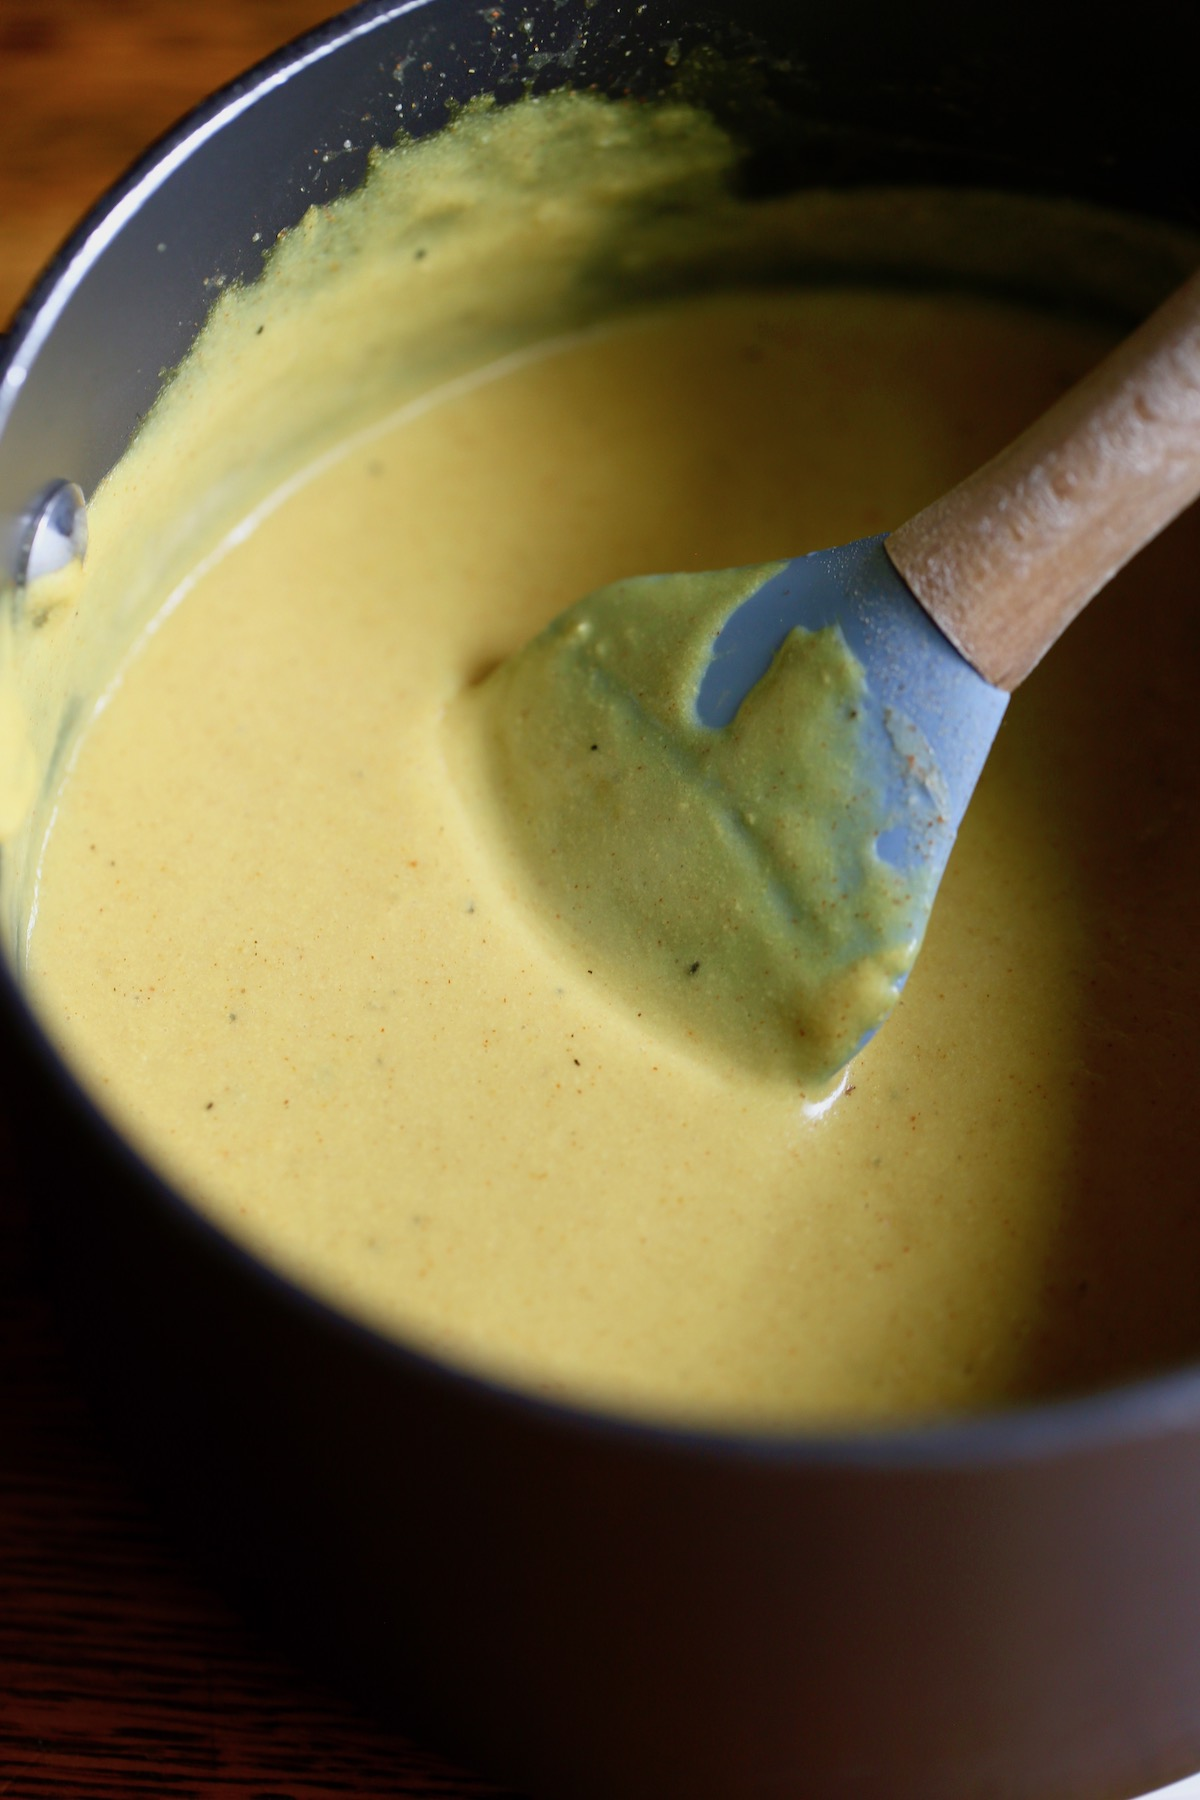 vegan cheese sauce thickening in a saucepan